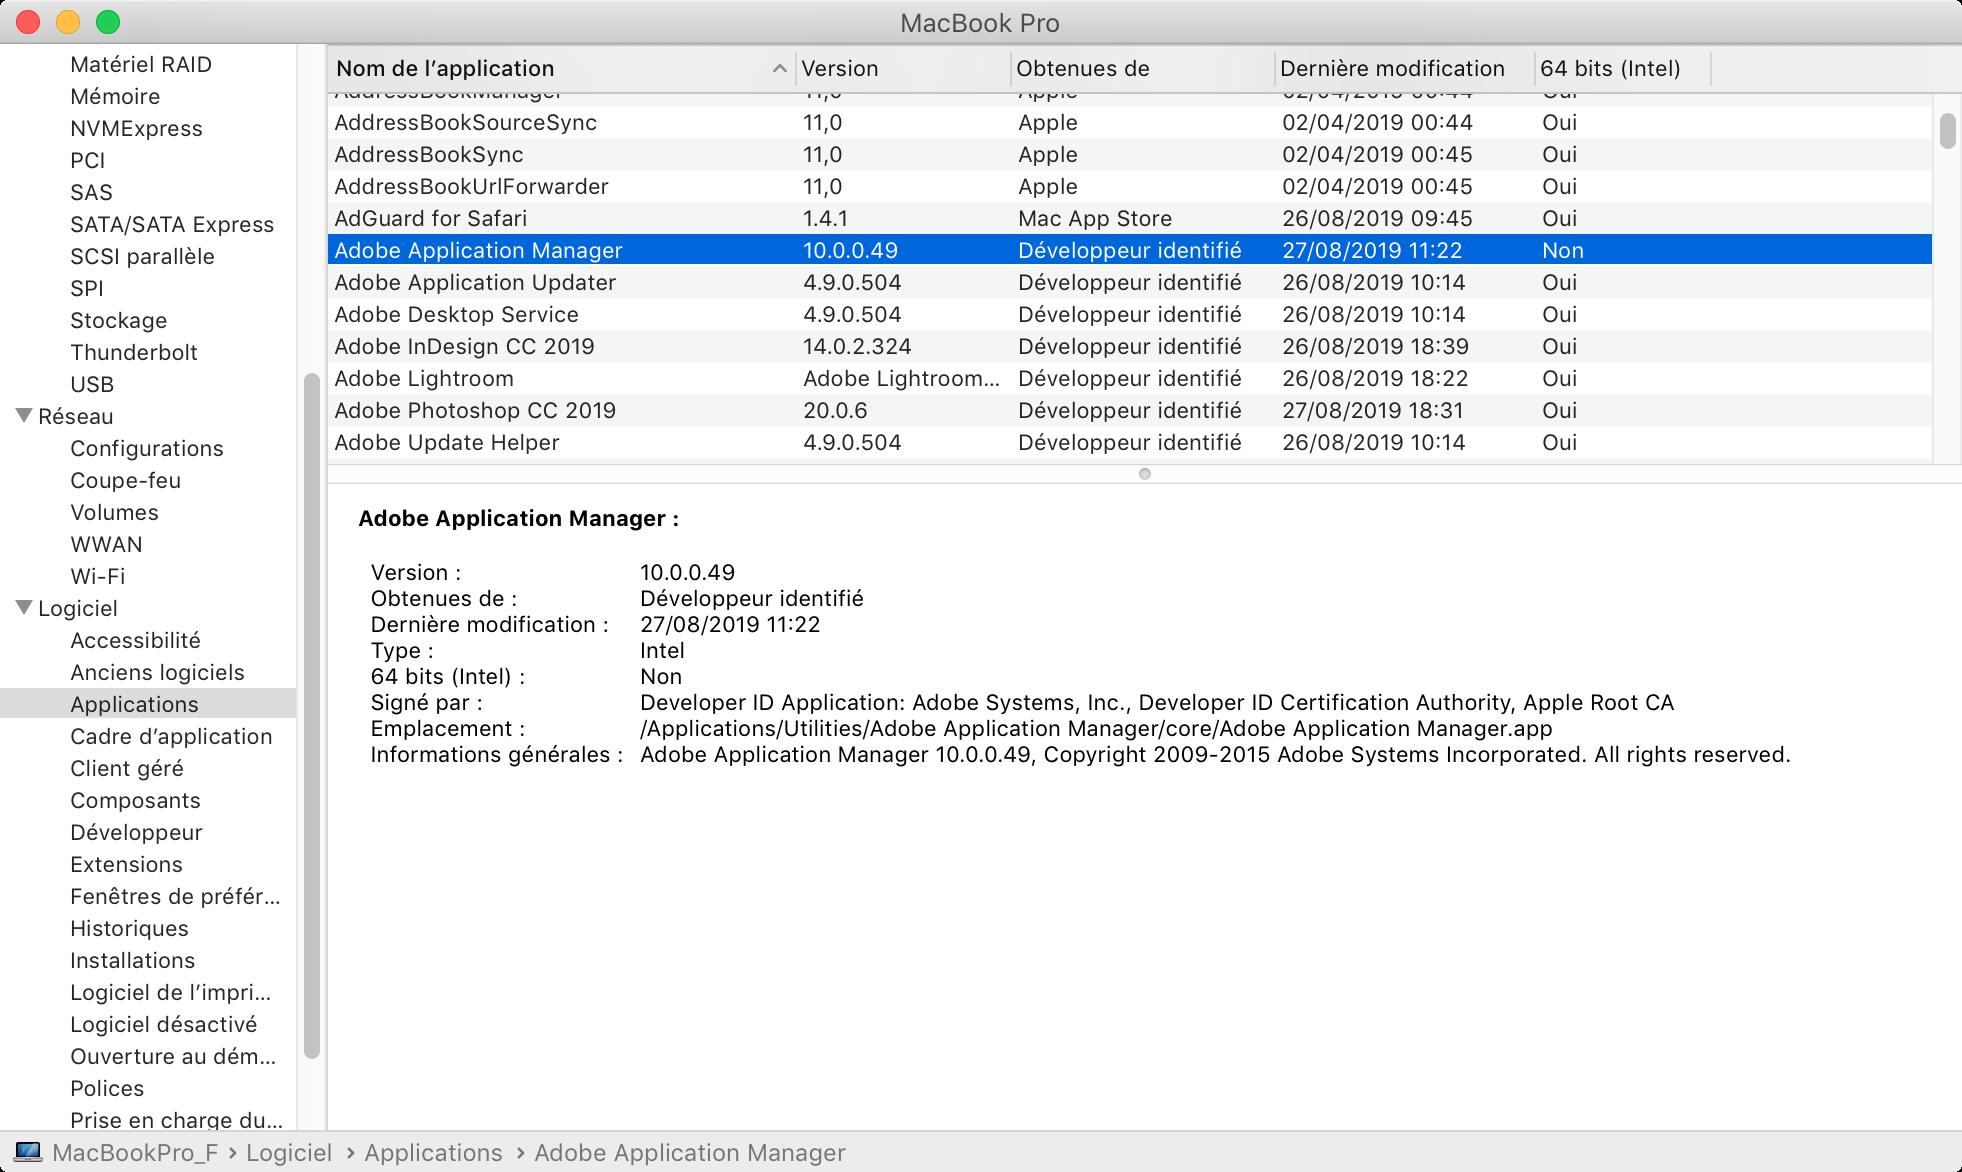 liste_app_32_64_bits.png